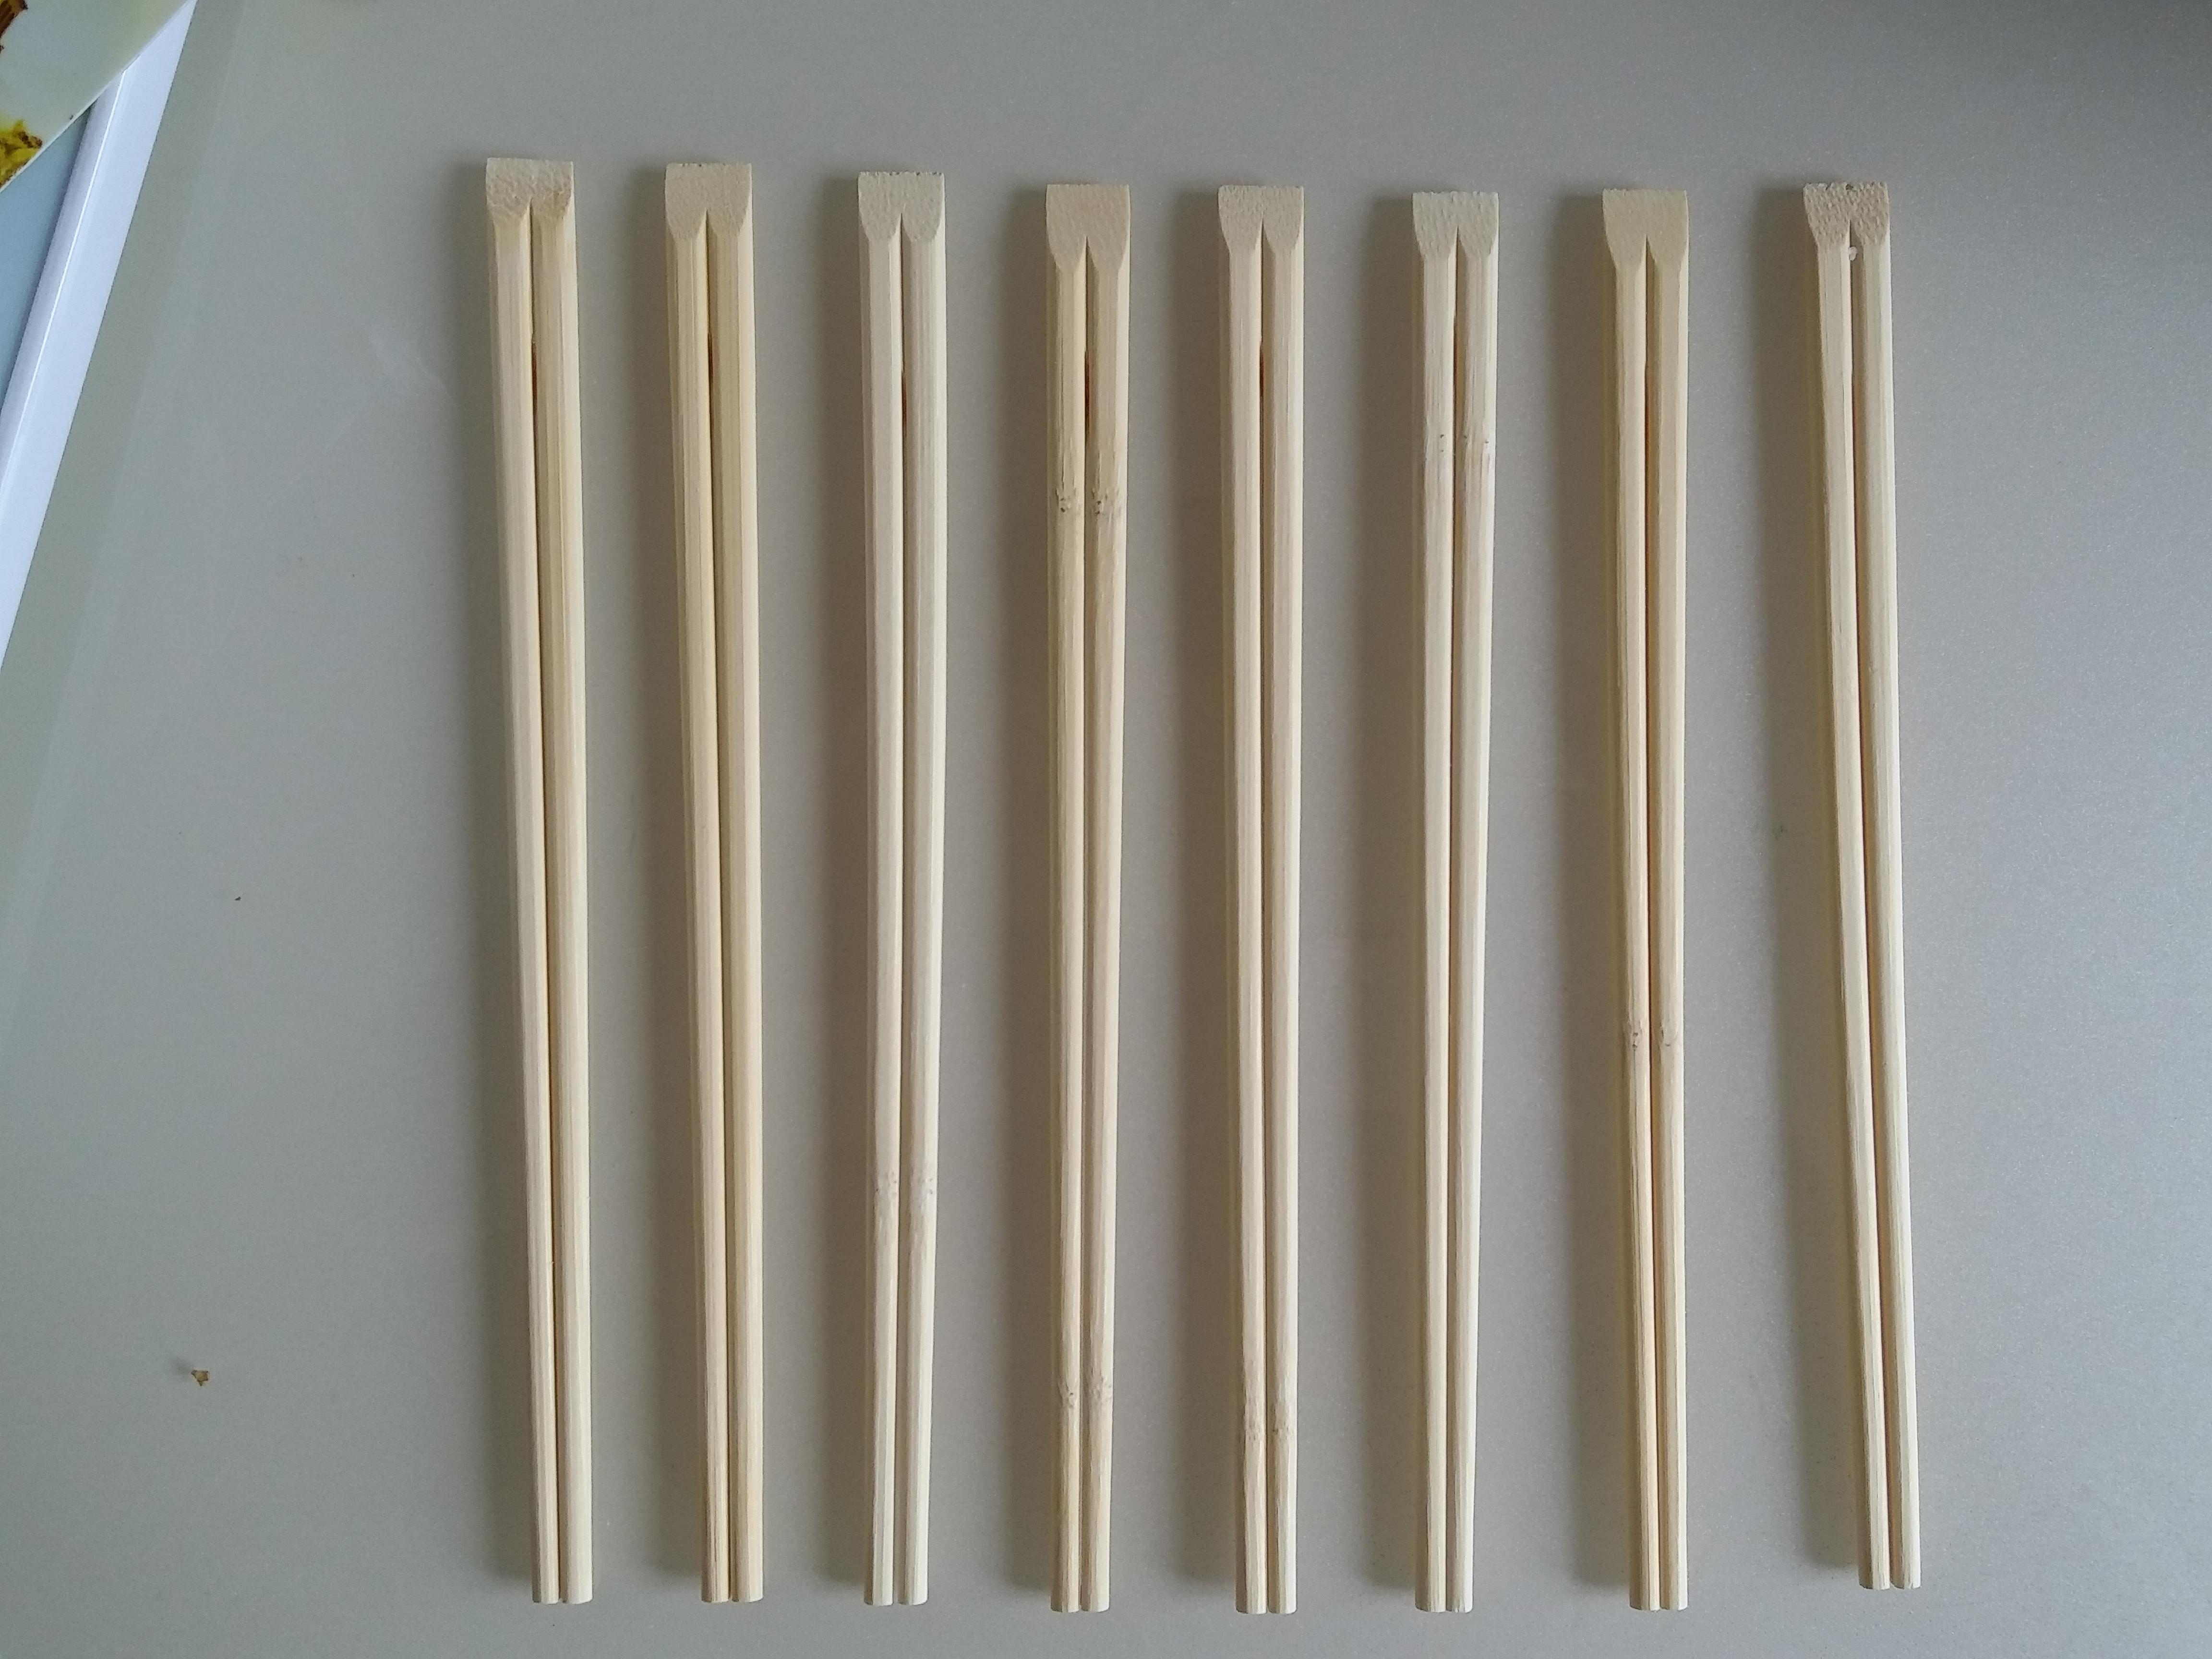 20cm 带节 天削筷  天削筷